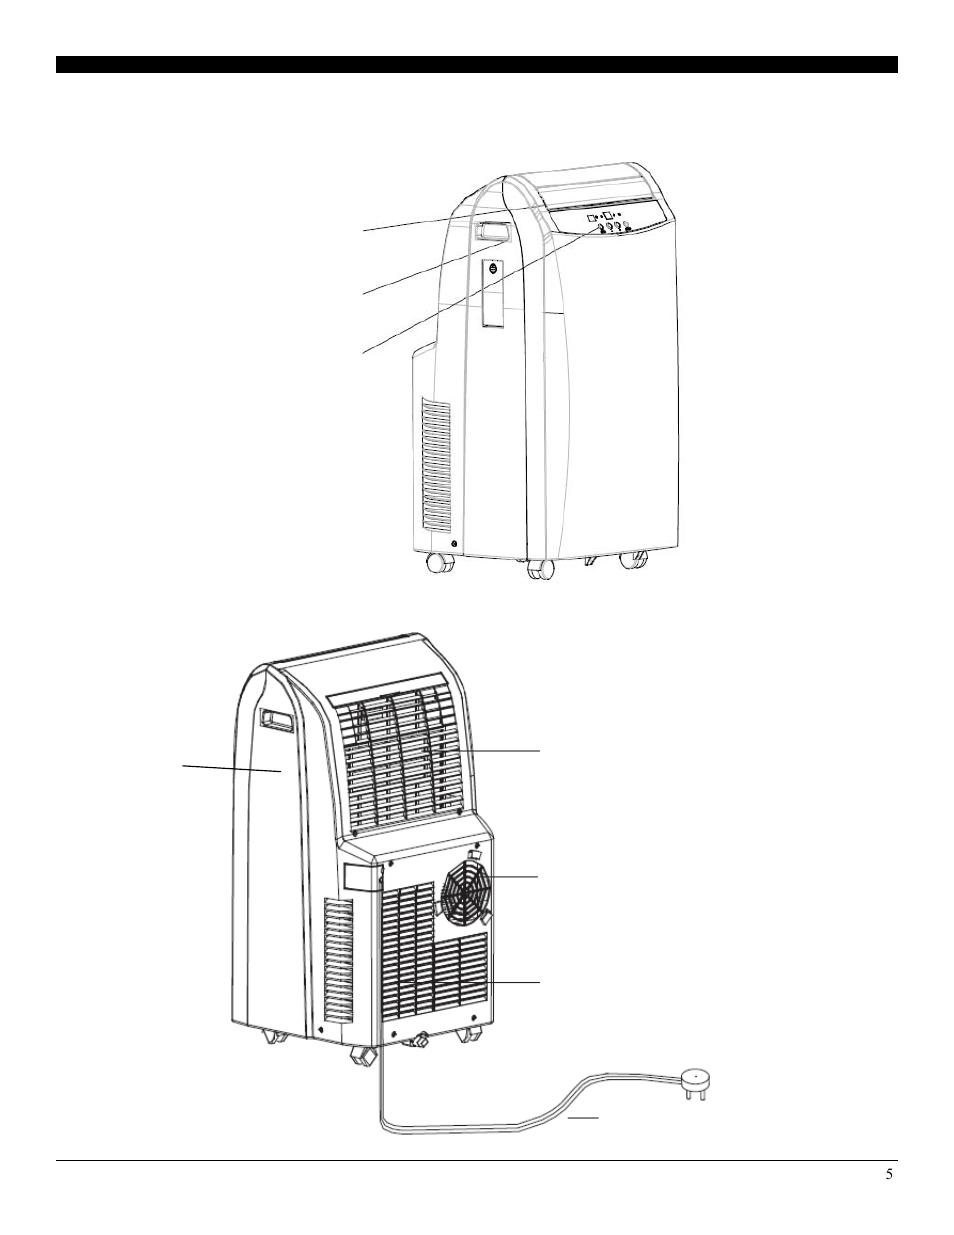 medium resolution of soleus air wiring diagram wiring diagram technic product diagram soleus air 12 user manual page 5